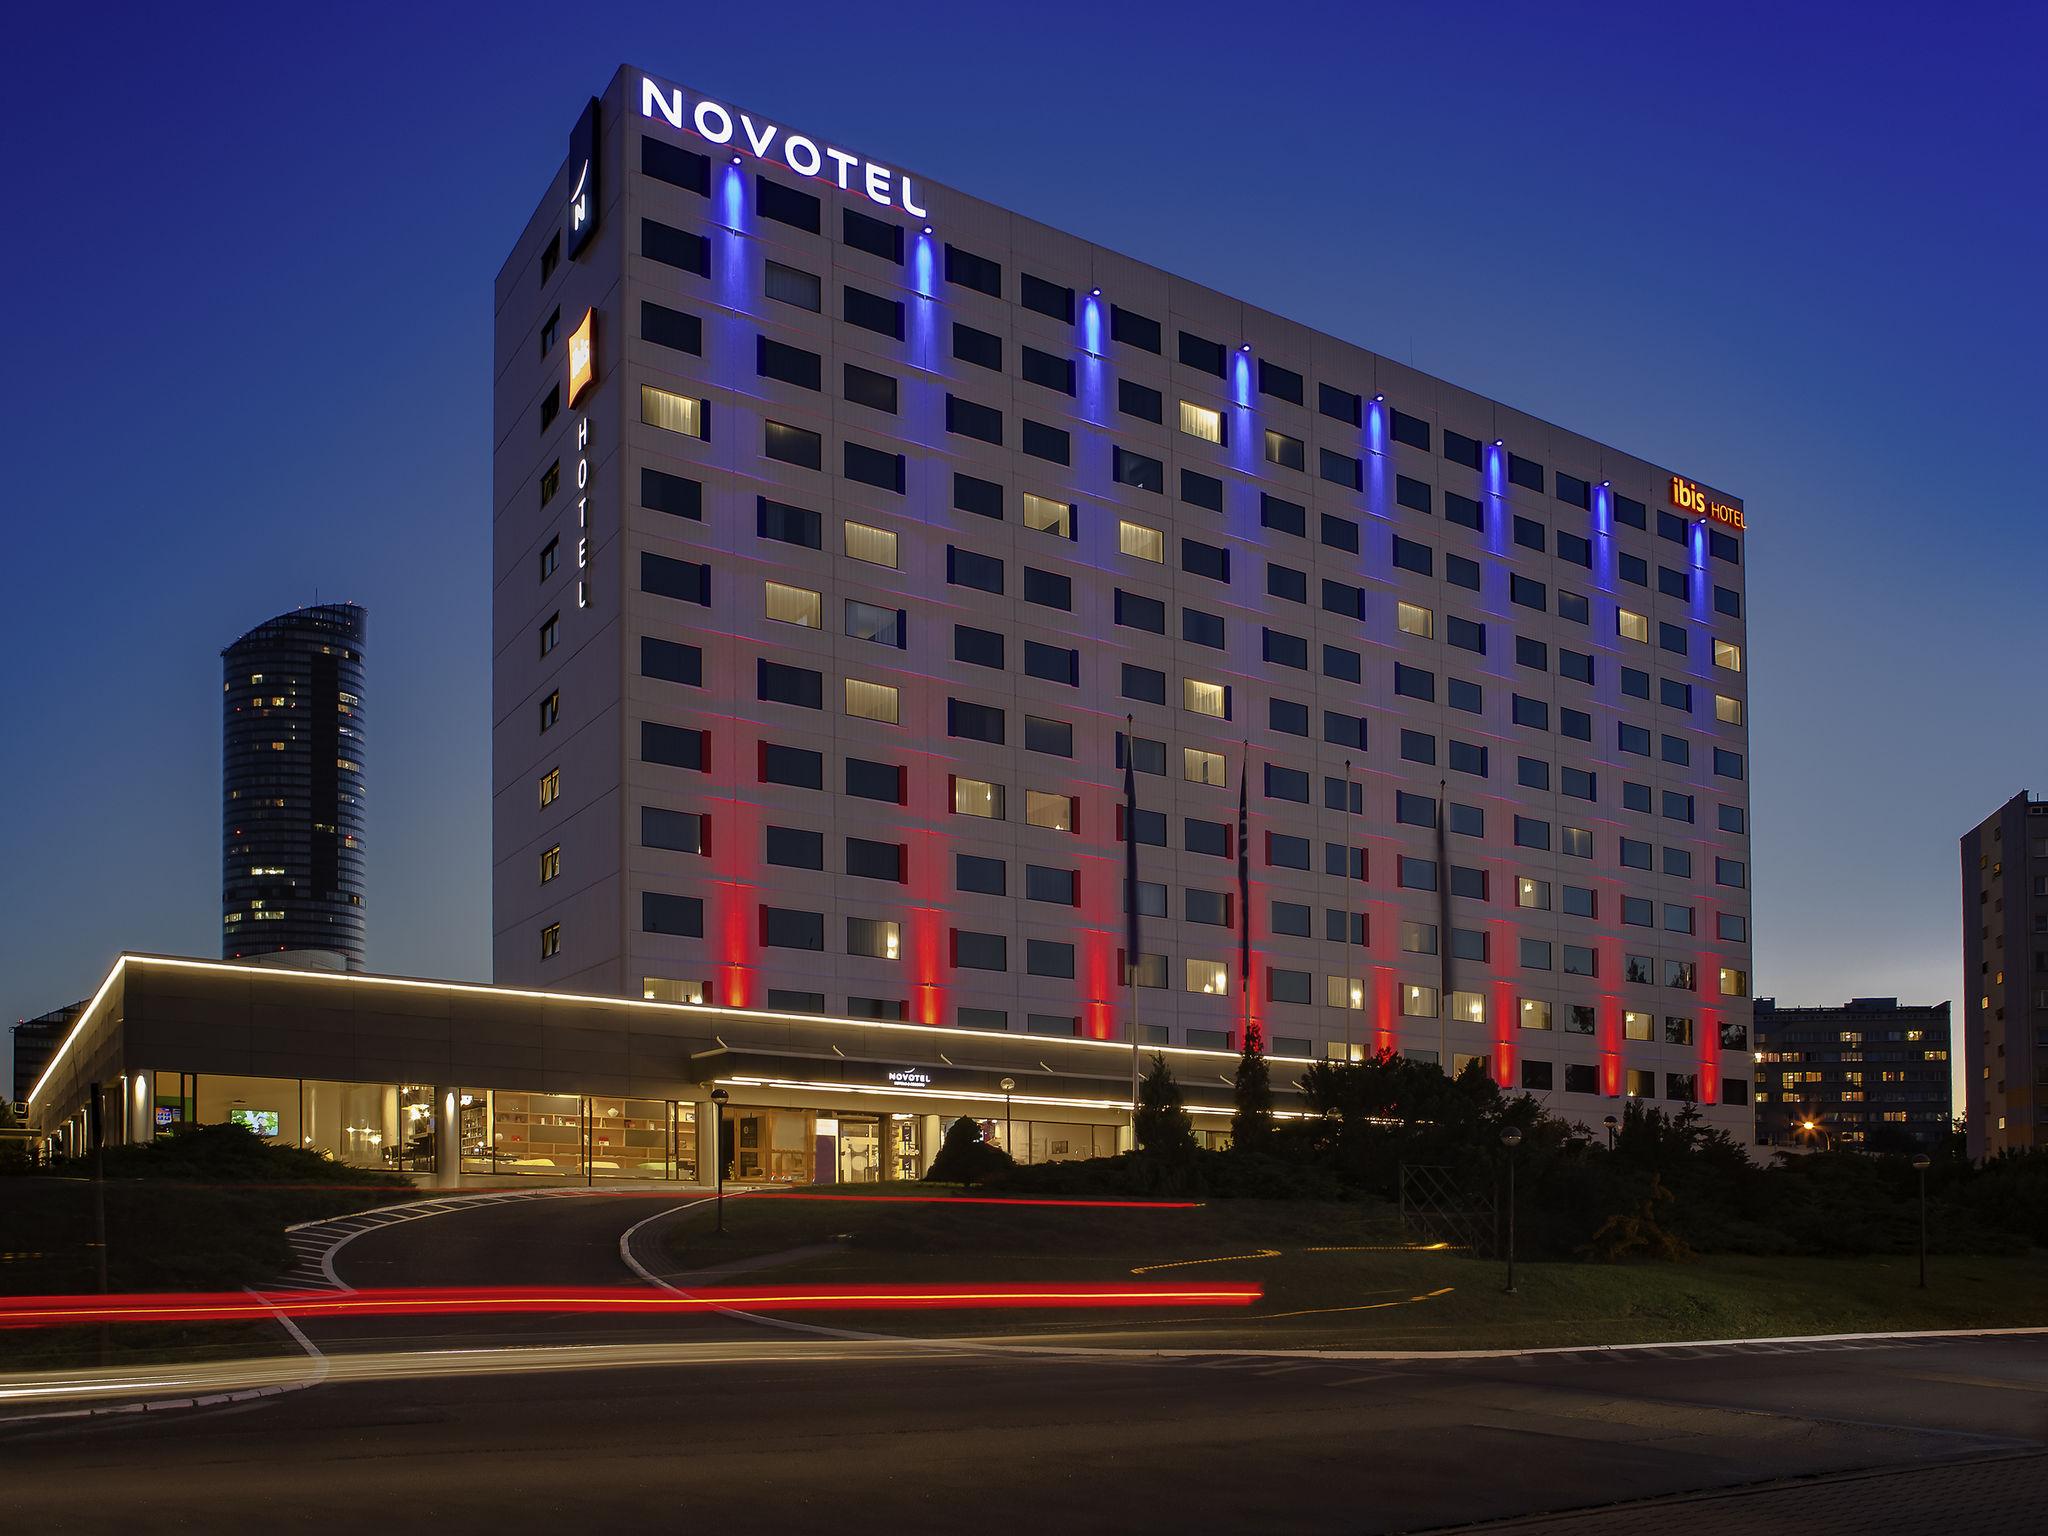 Hotell – Novotel Wroclaw Centrum